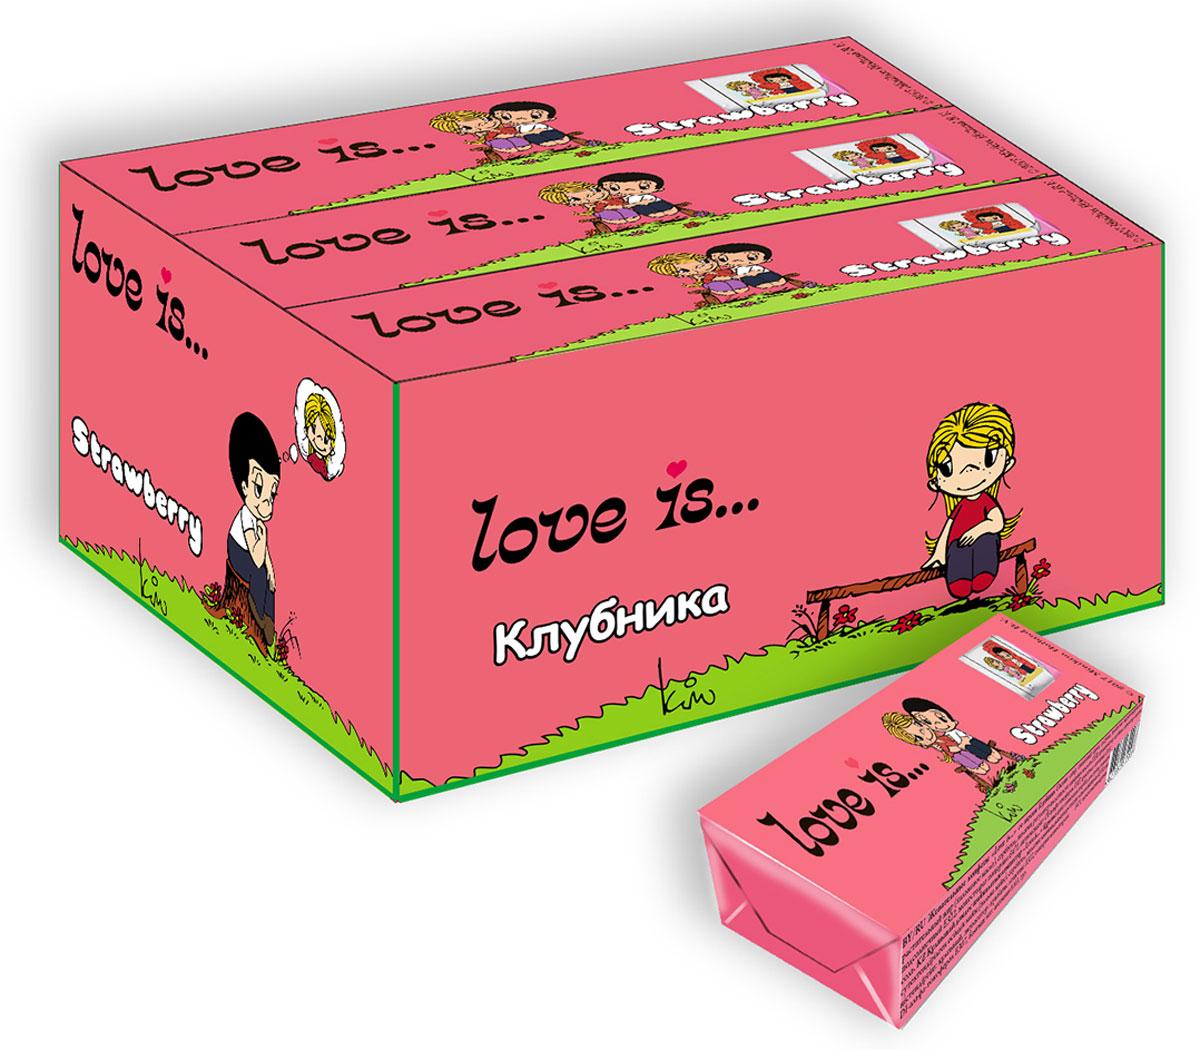 Love is Клубника жевательные конфеты, 12 шт love is микс жевательные конфеты девочки 125 г